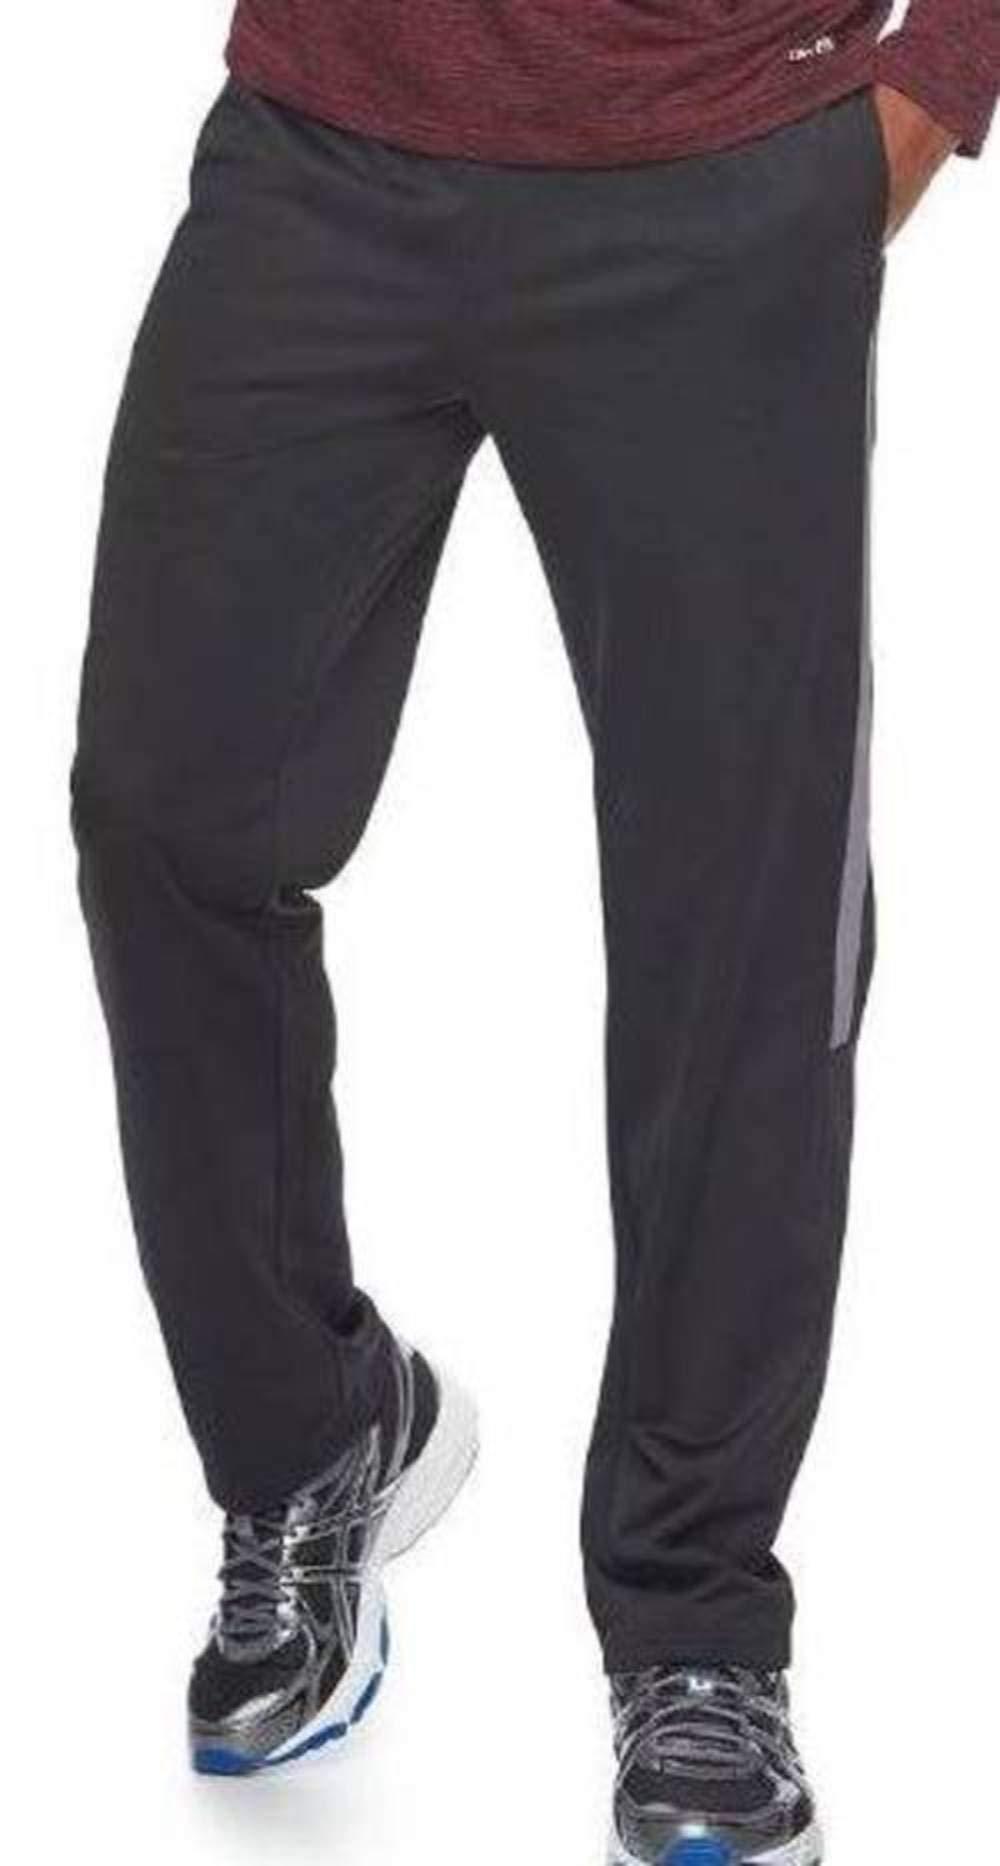 Tek Gear Men's Black Gray Active Athletic Sweat Track Pants-Size 2XL by Tek Gear